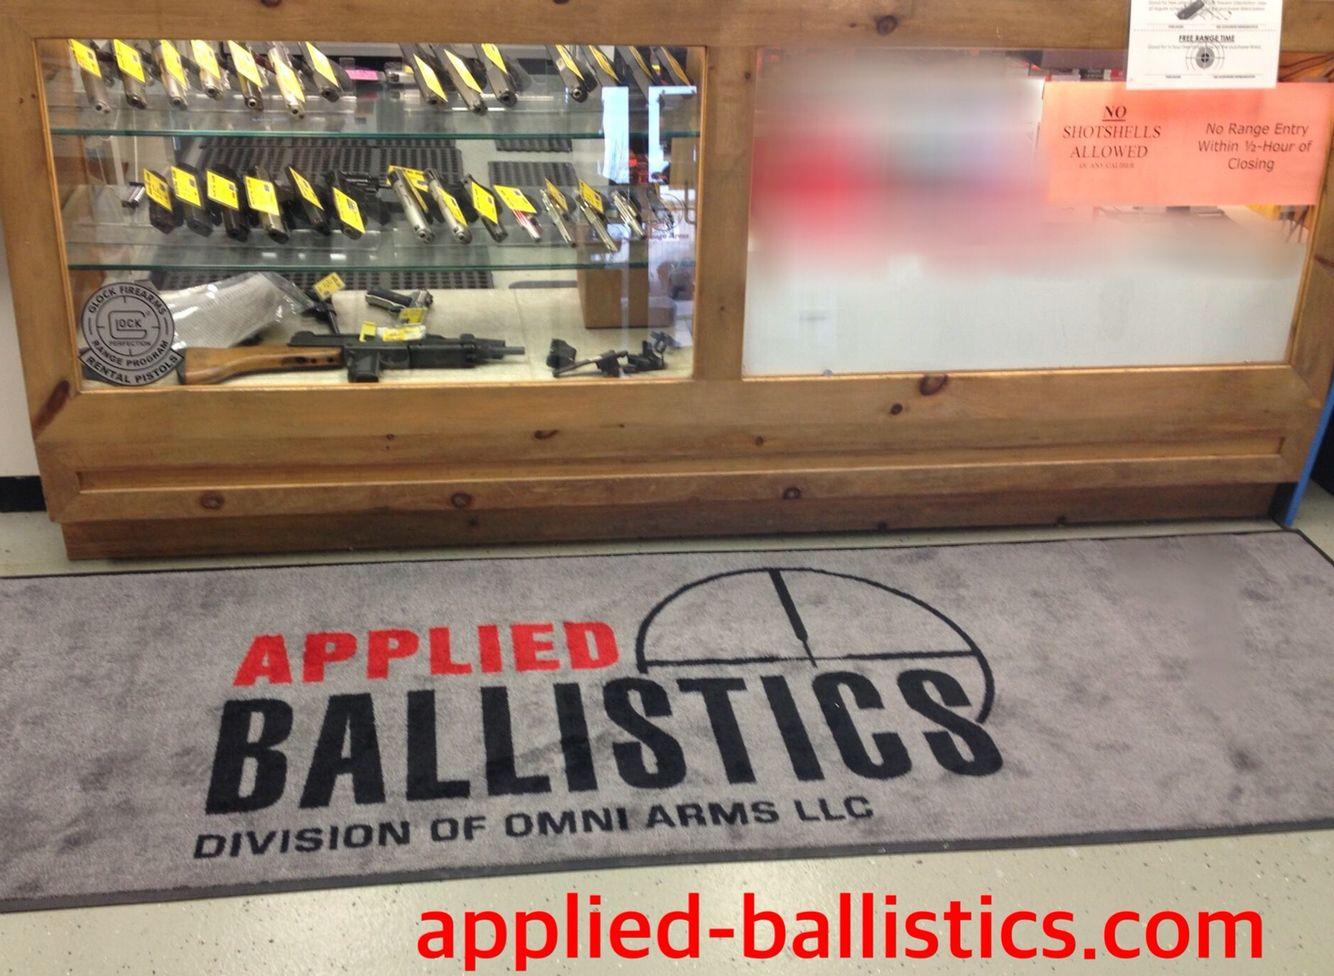 Love our Cintas mat! #appliedballistics #indoorrange #Cintas